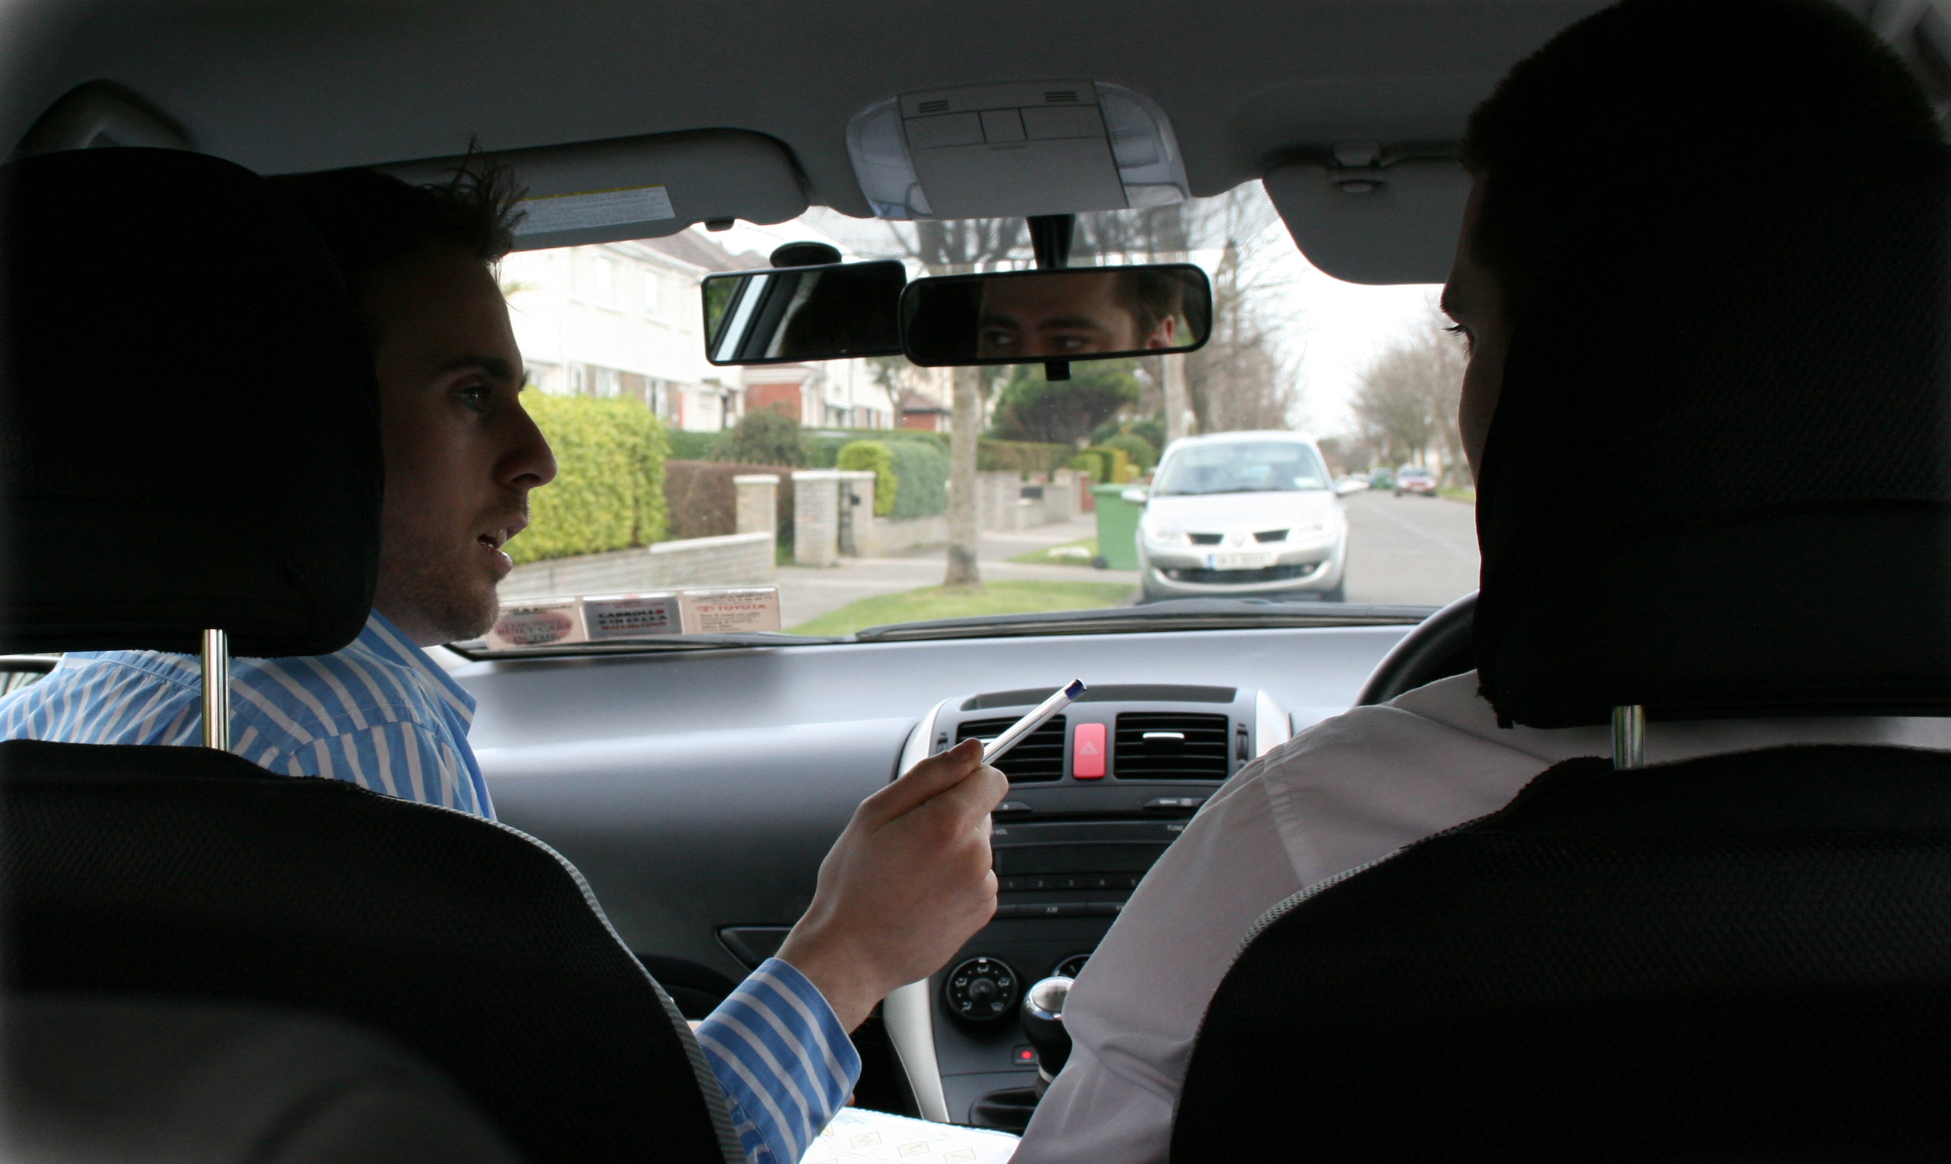 easydrive school of motoring case study